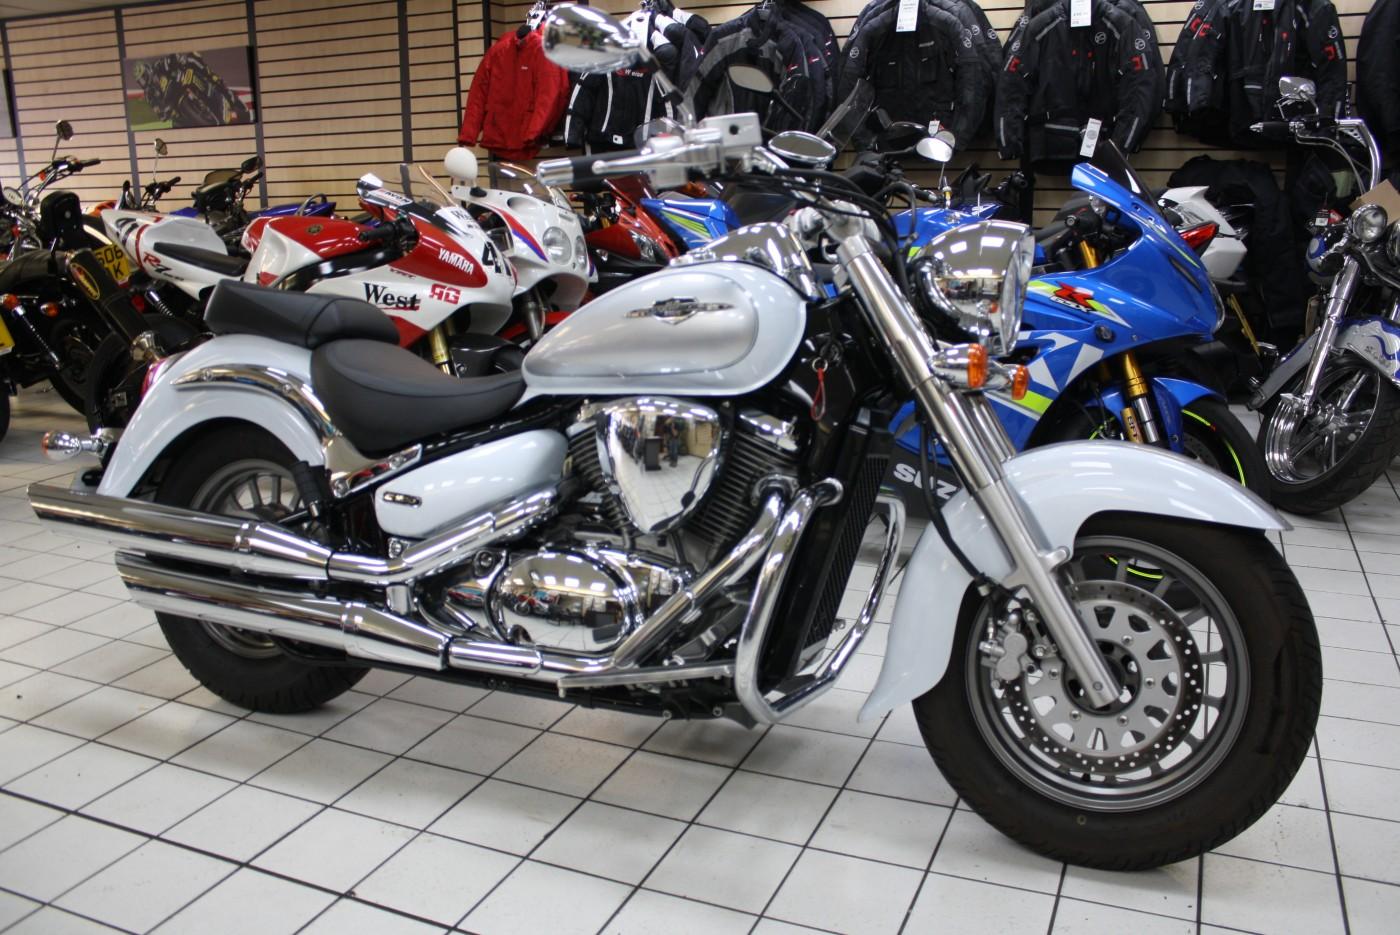 Suzuki VL C800 Custom